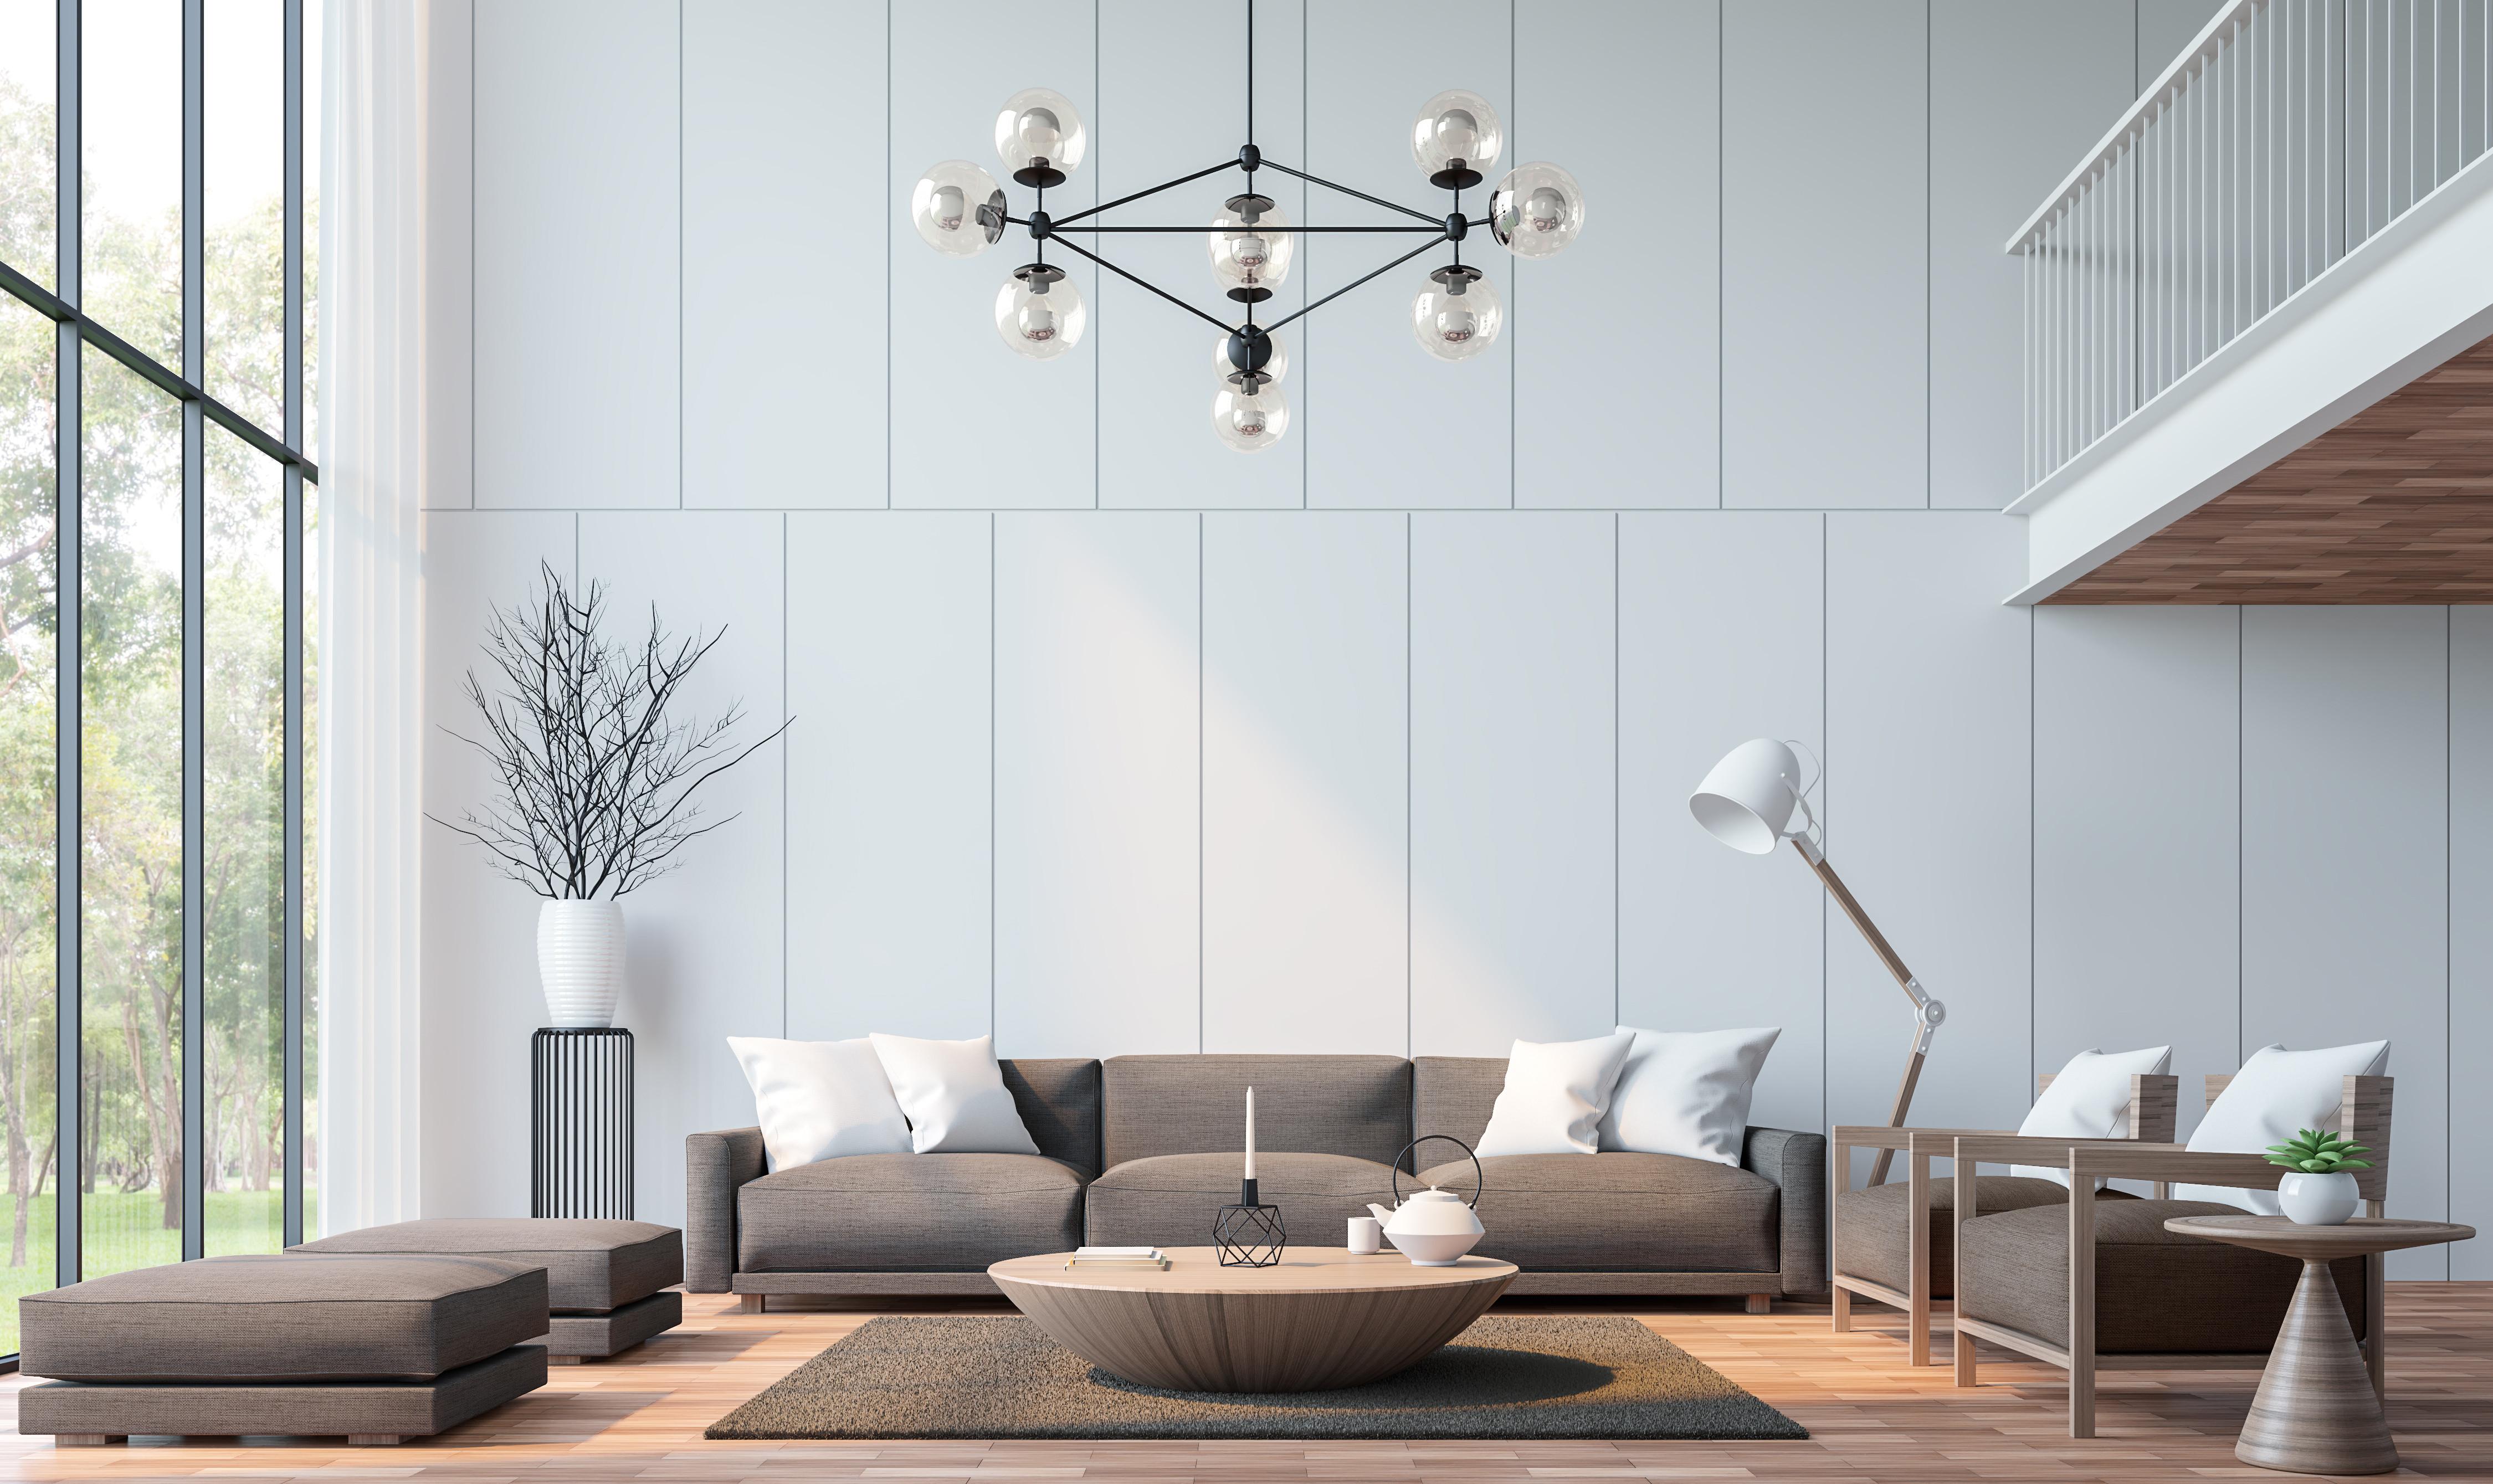 Interior Design by Lisa Jackson